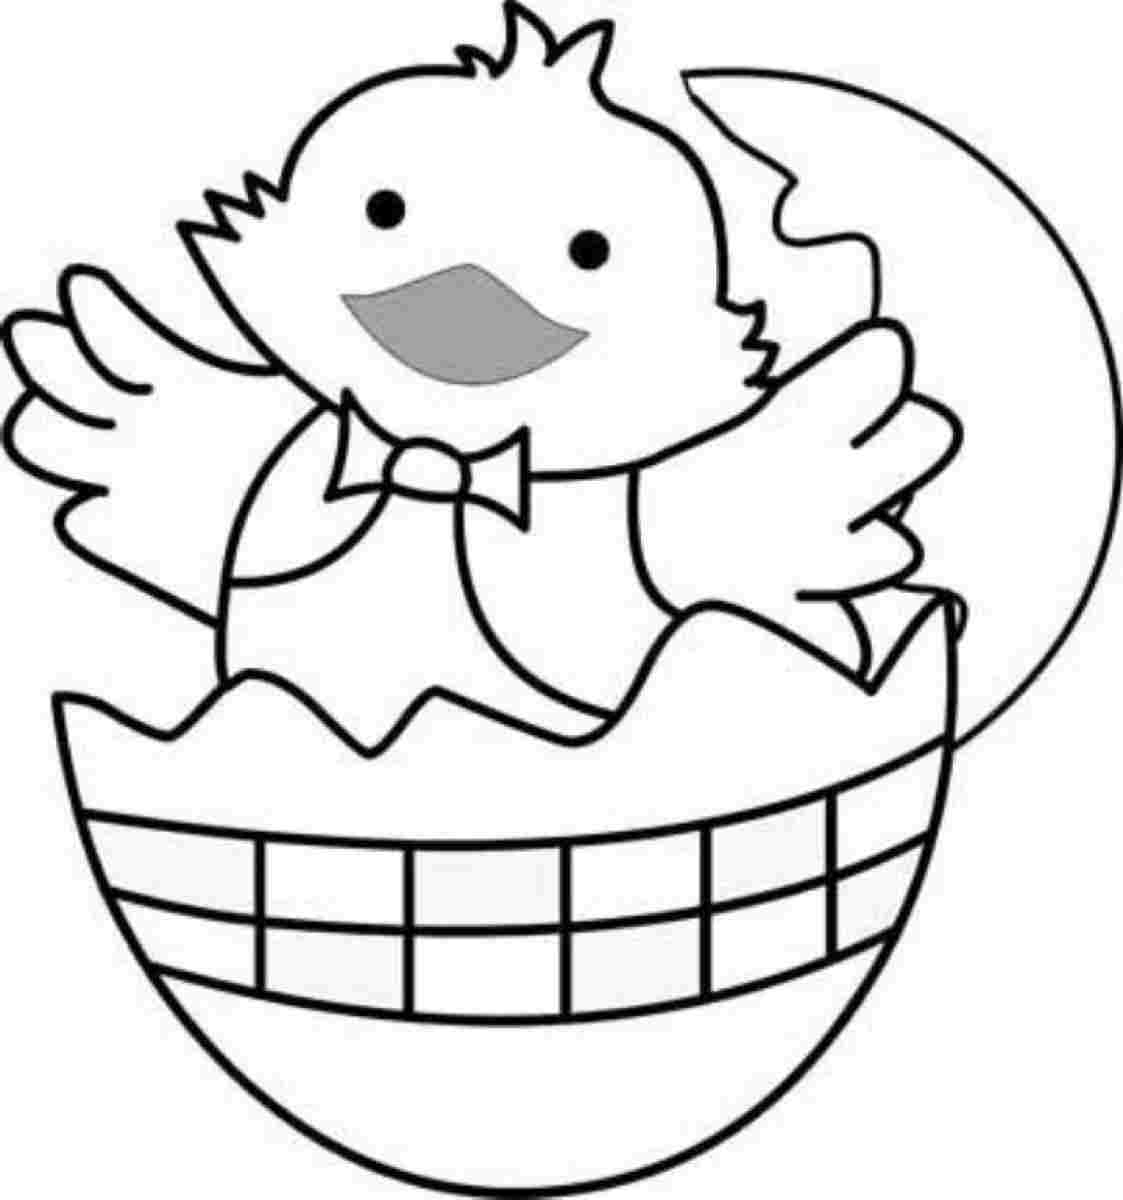 Easter Bunny Templates For Kindergarten